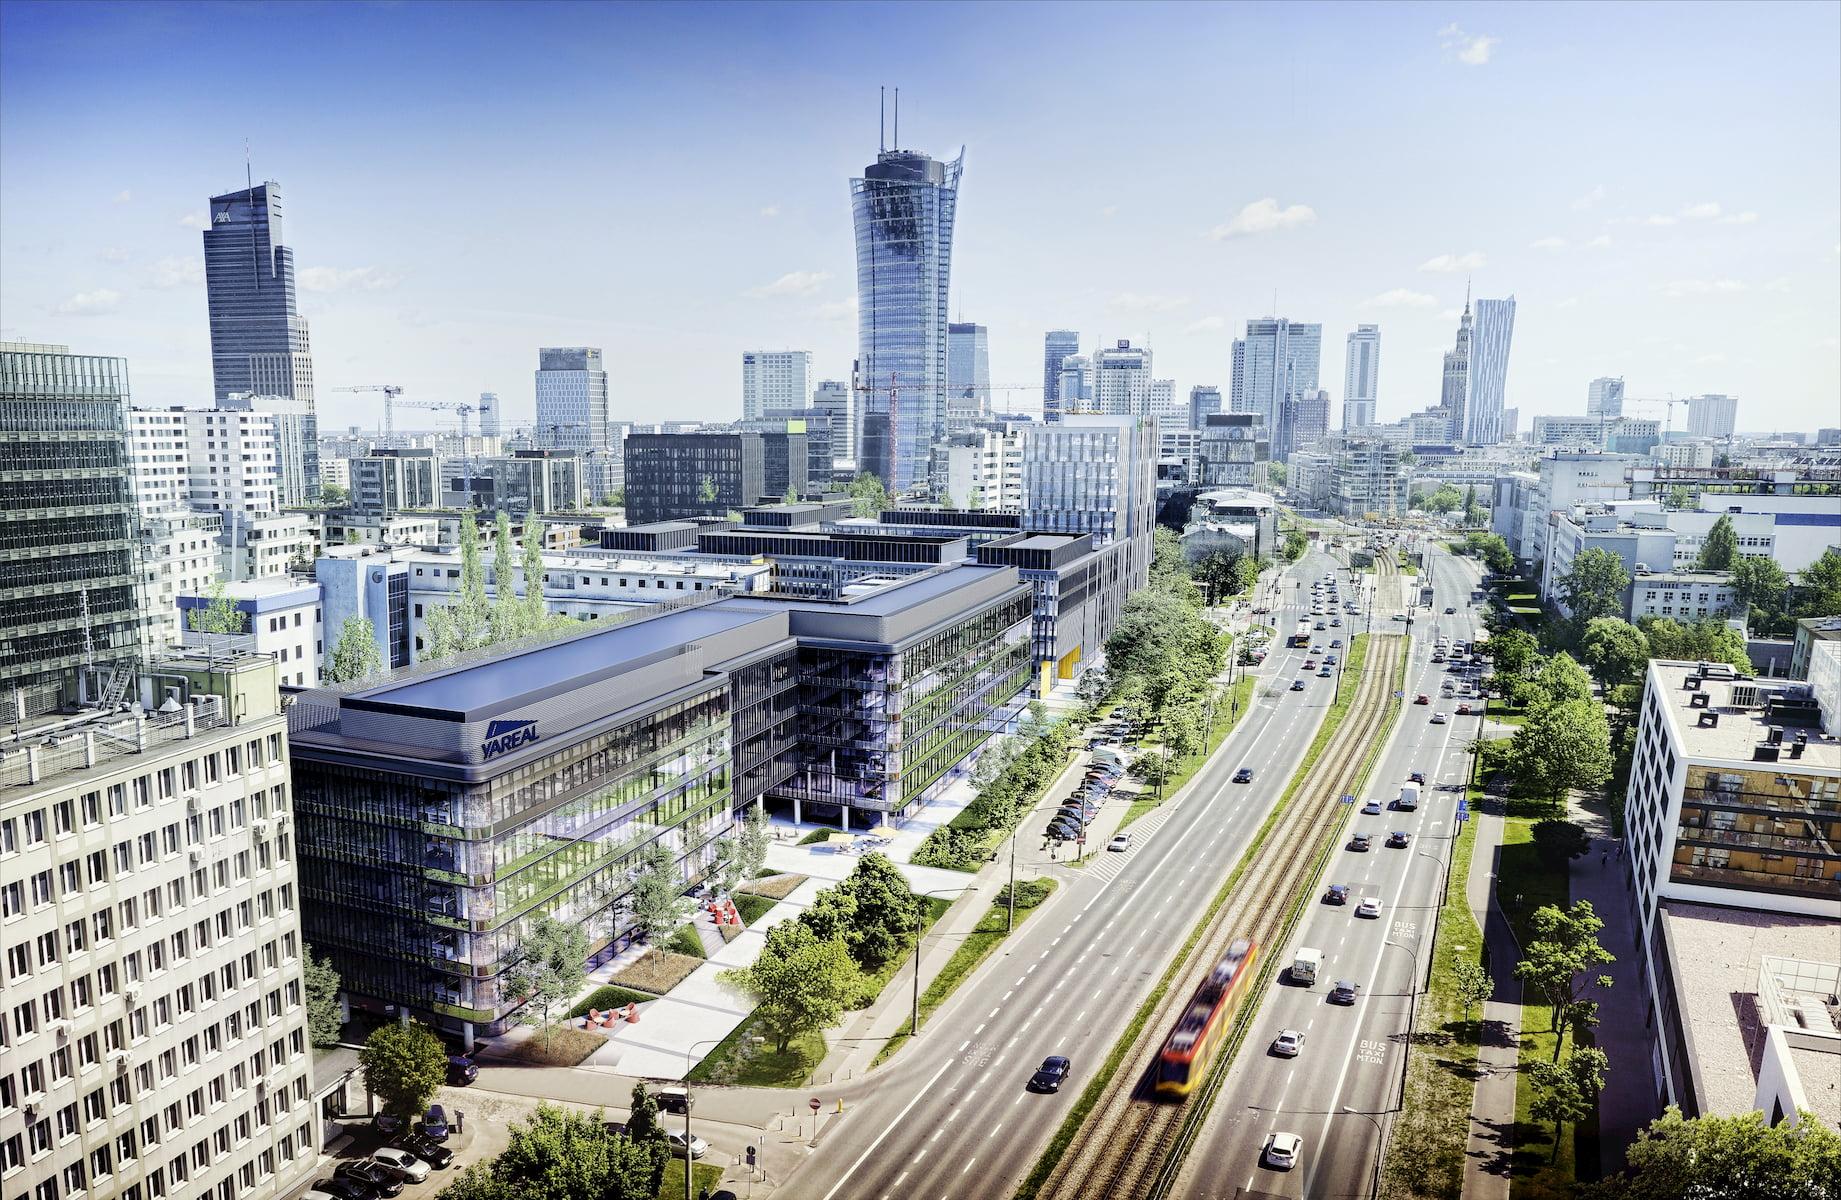 Lixa Office Park Yareal HRA Architekci 2014-2018 aerial view